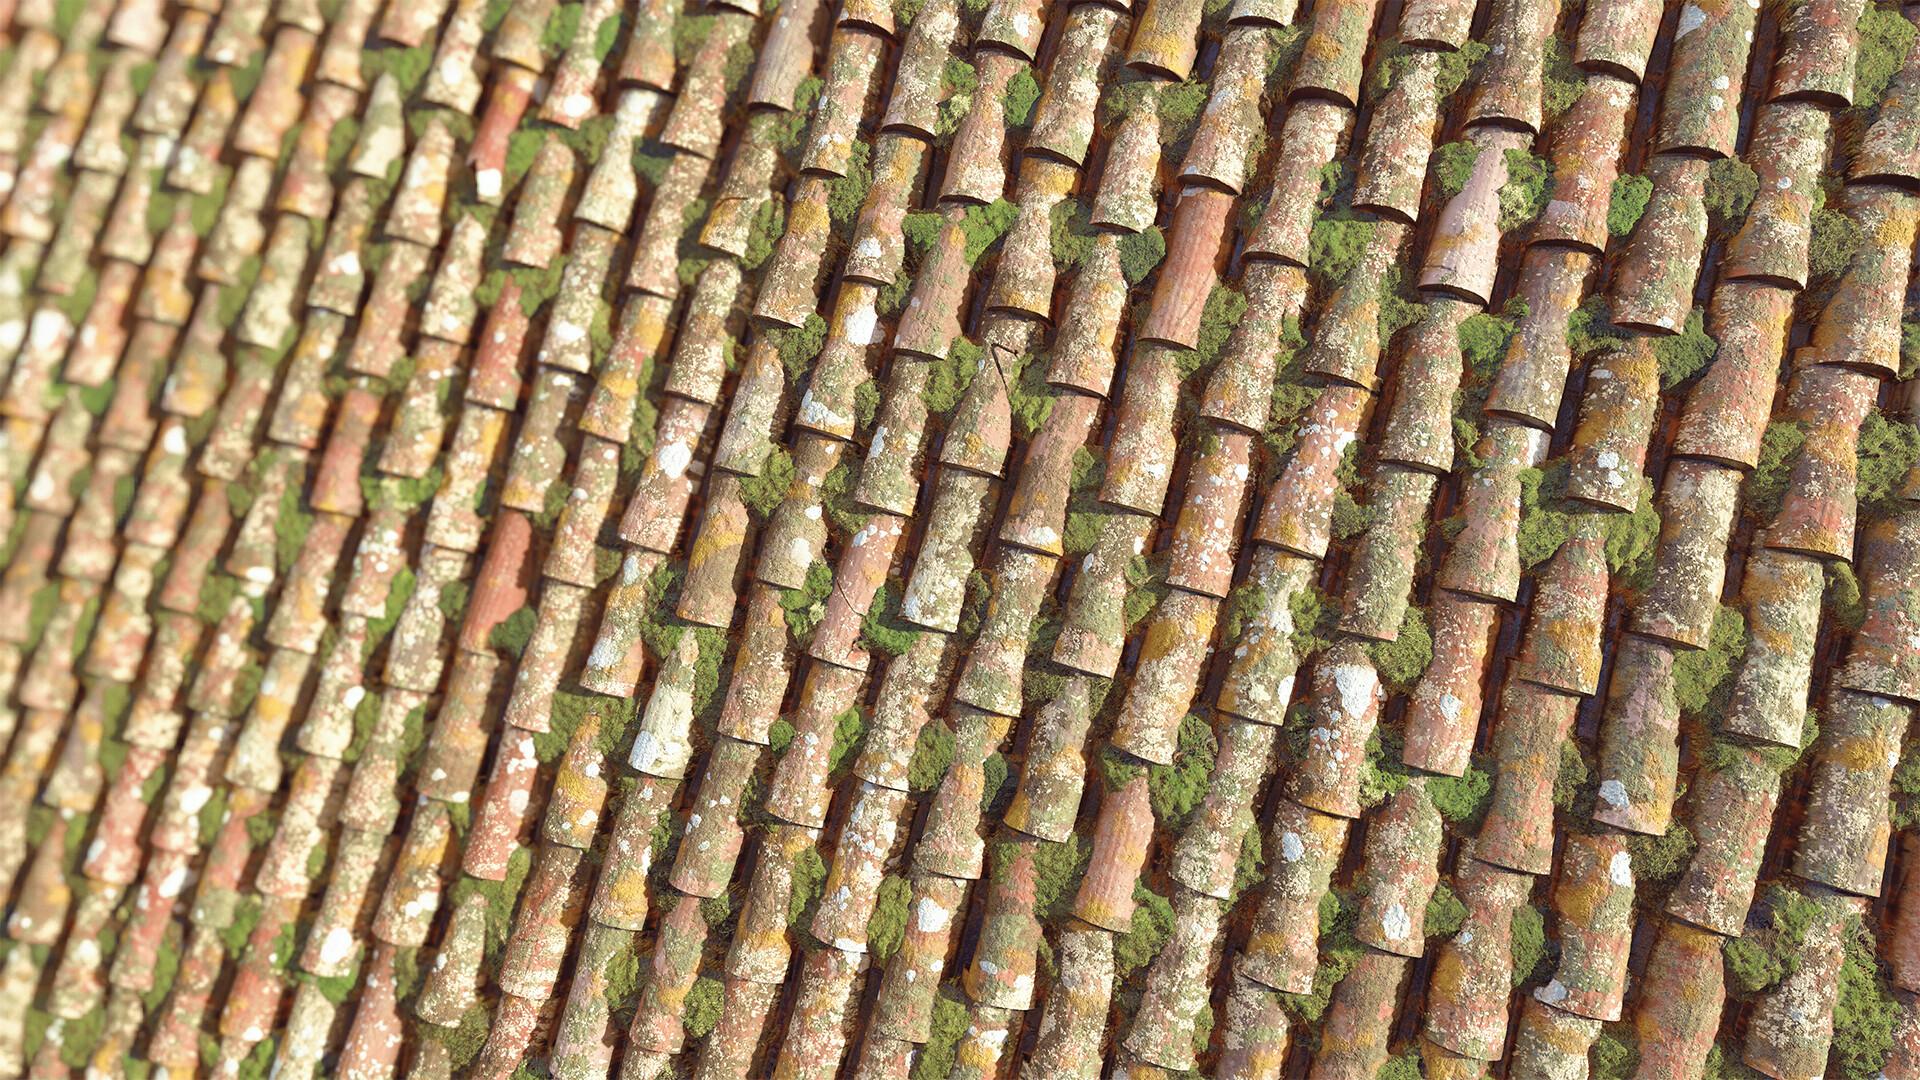 James lucas jameslucas rooftiles heroalt withdof graded 1080